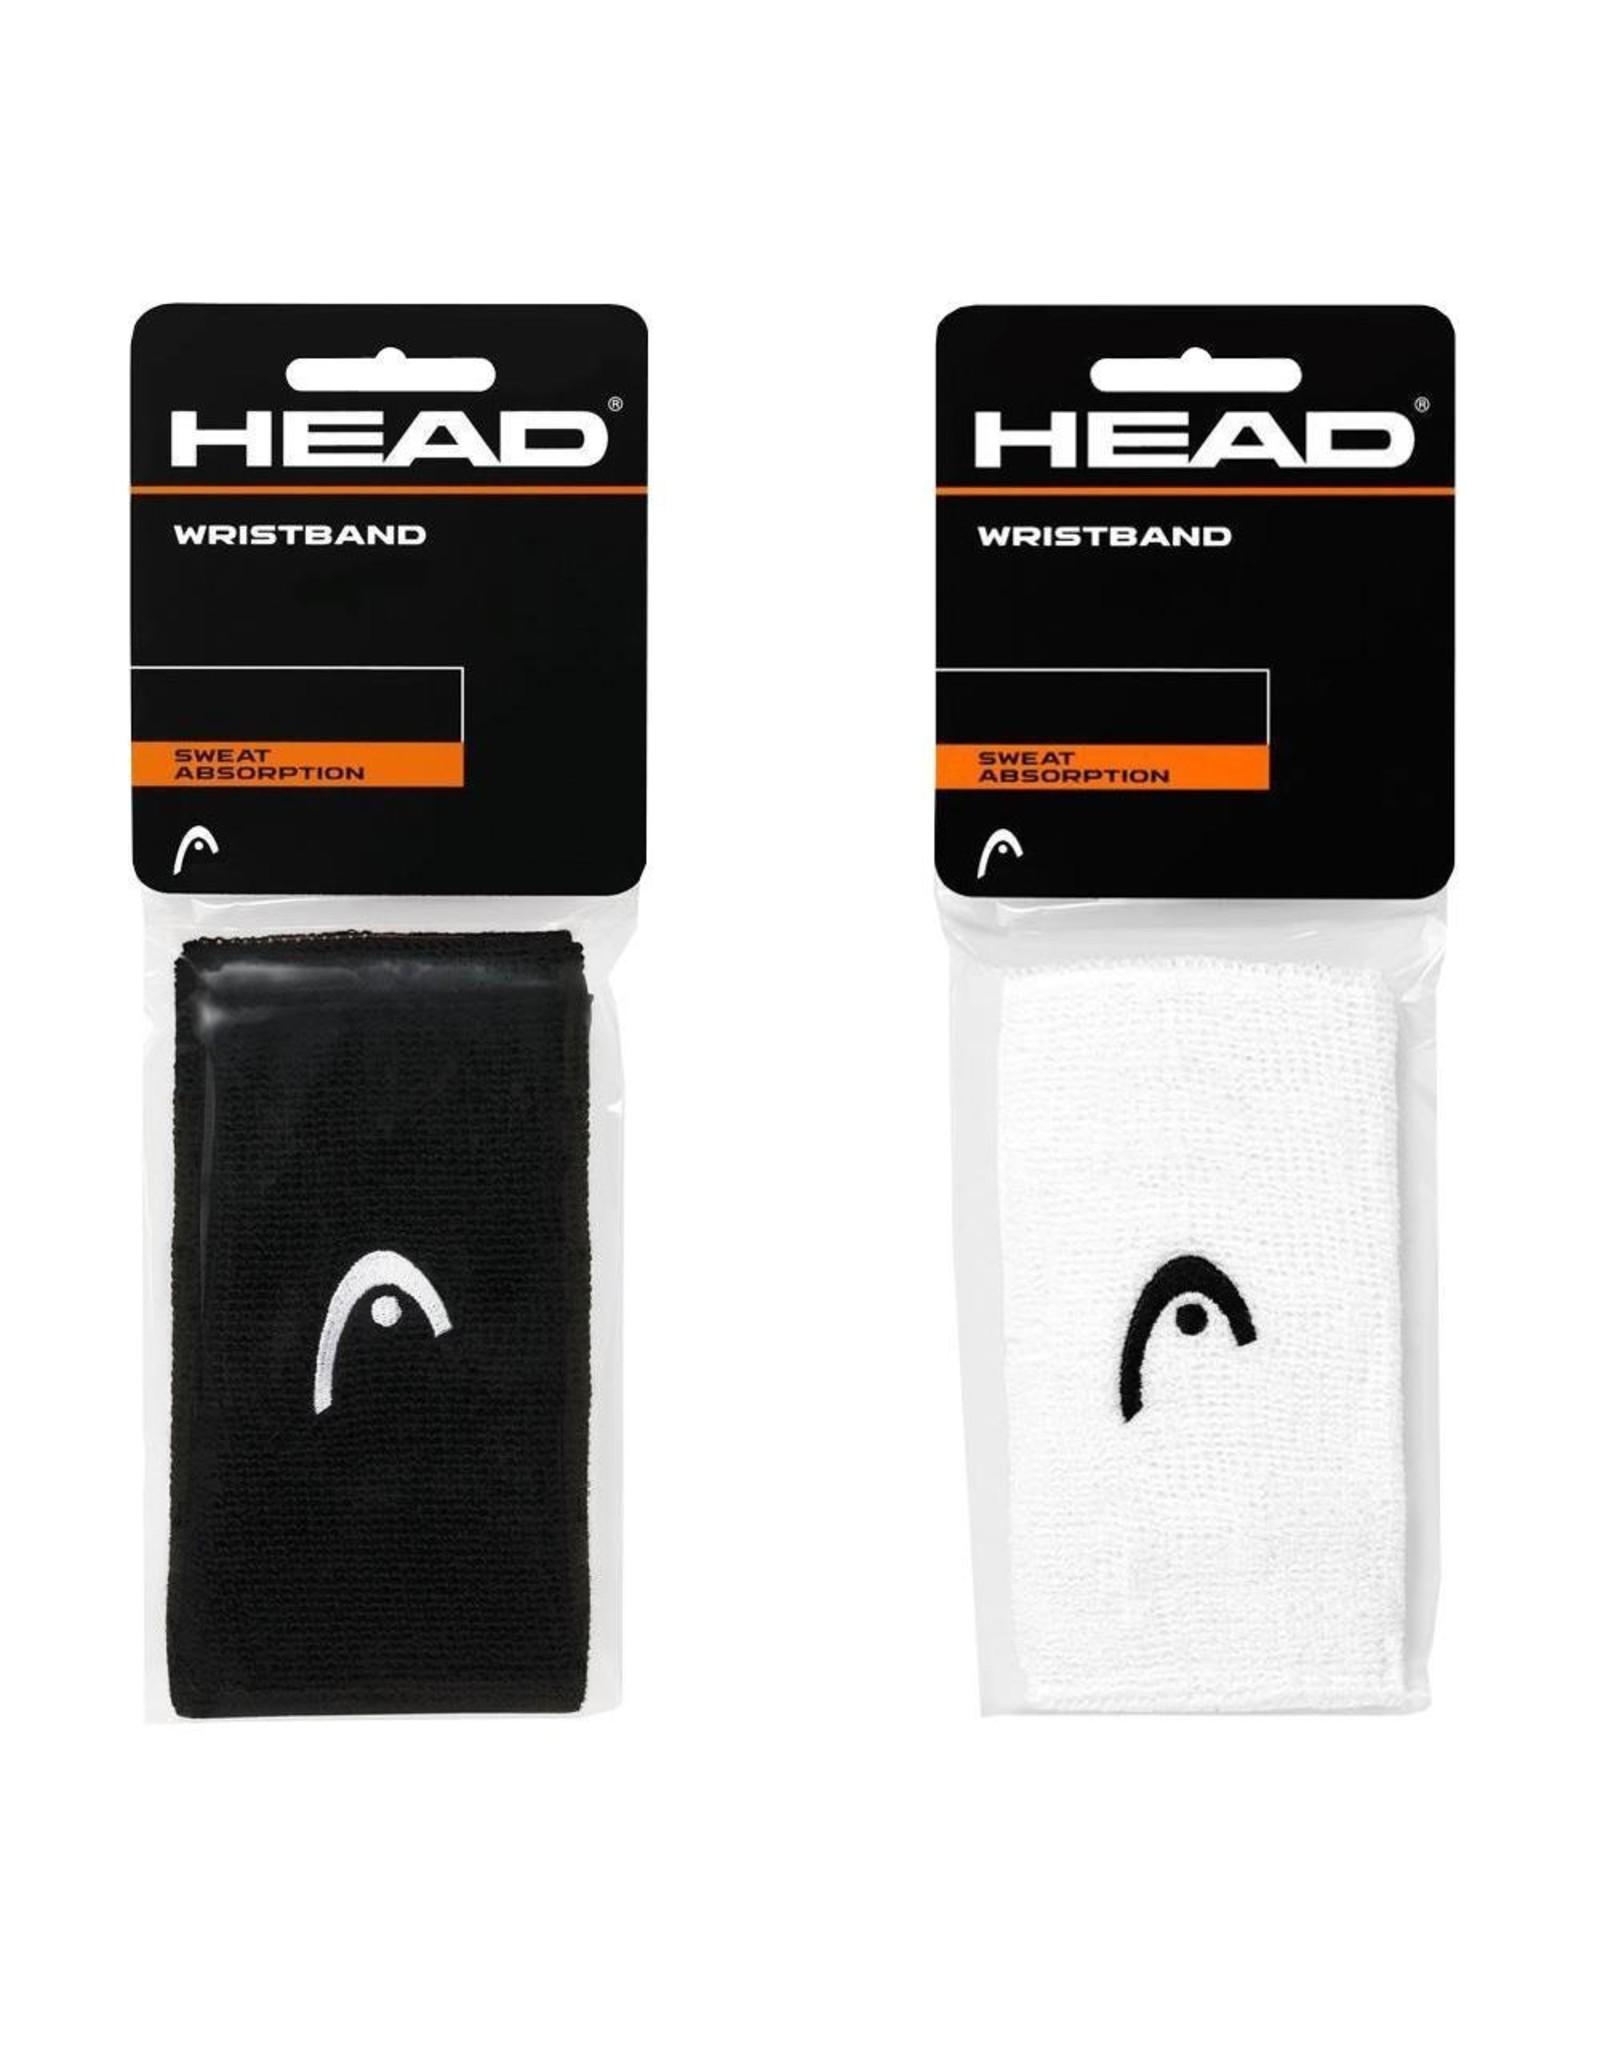 POIGNET HEAD